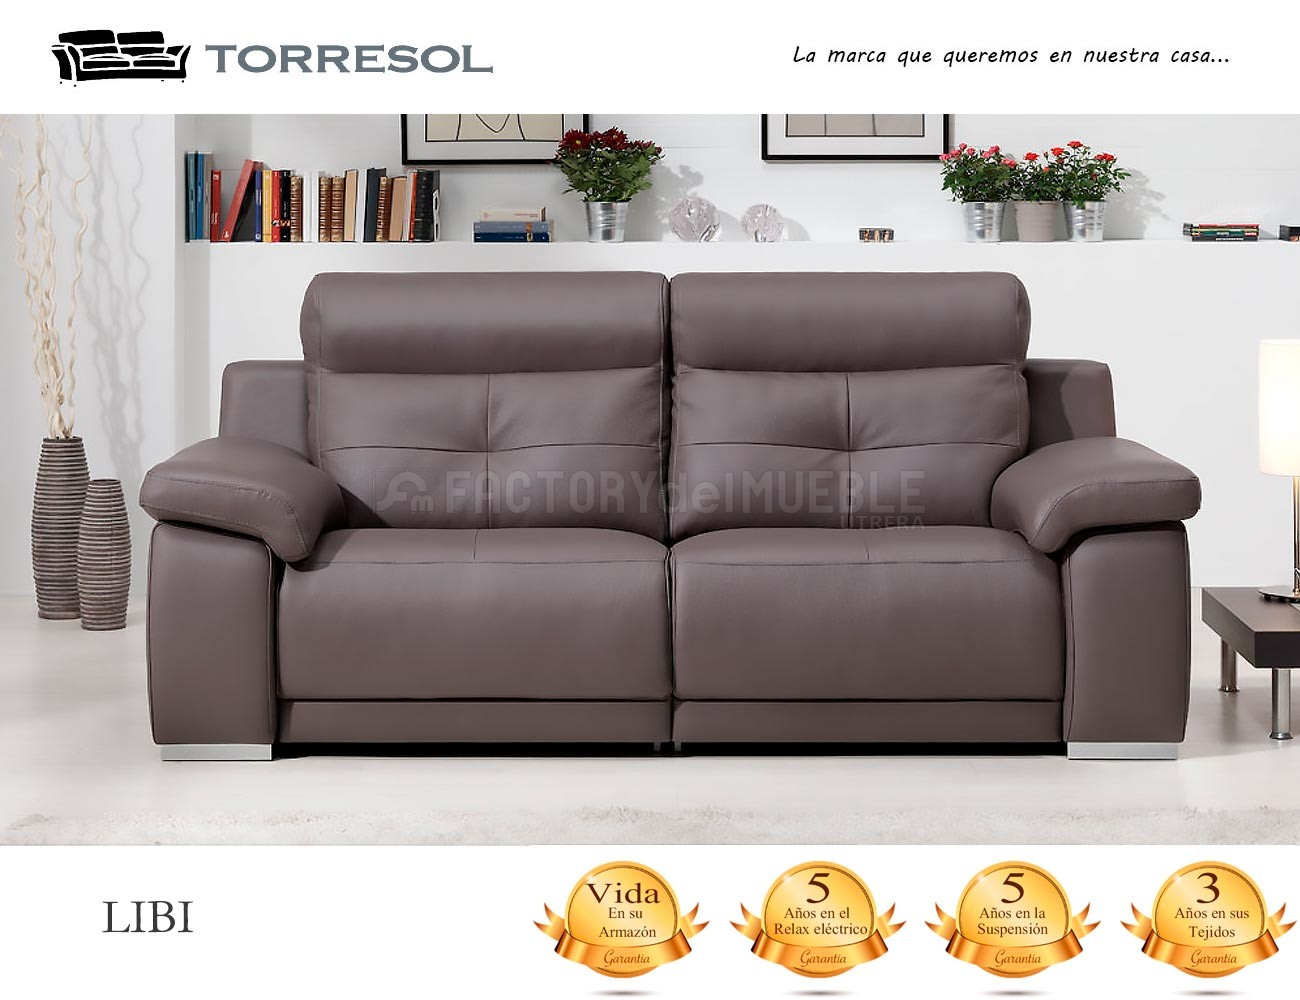 Sofa libi torresol en piel chocolate1